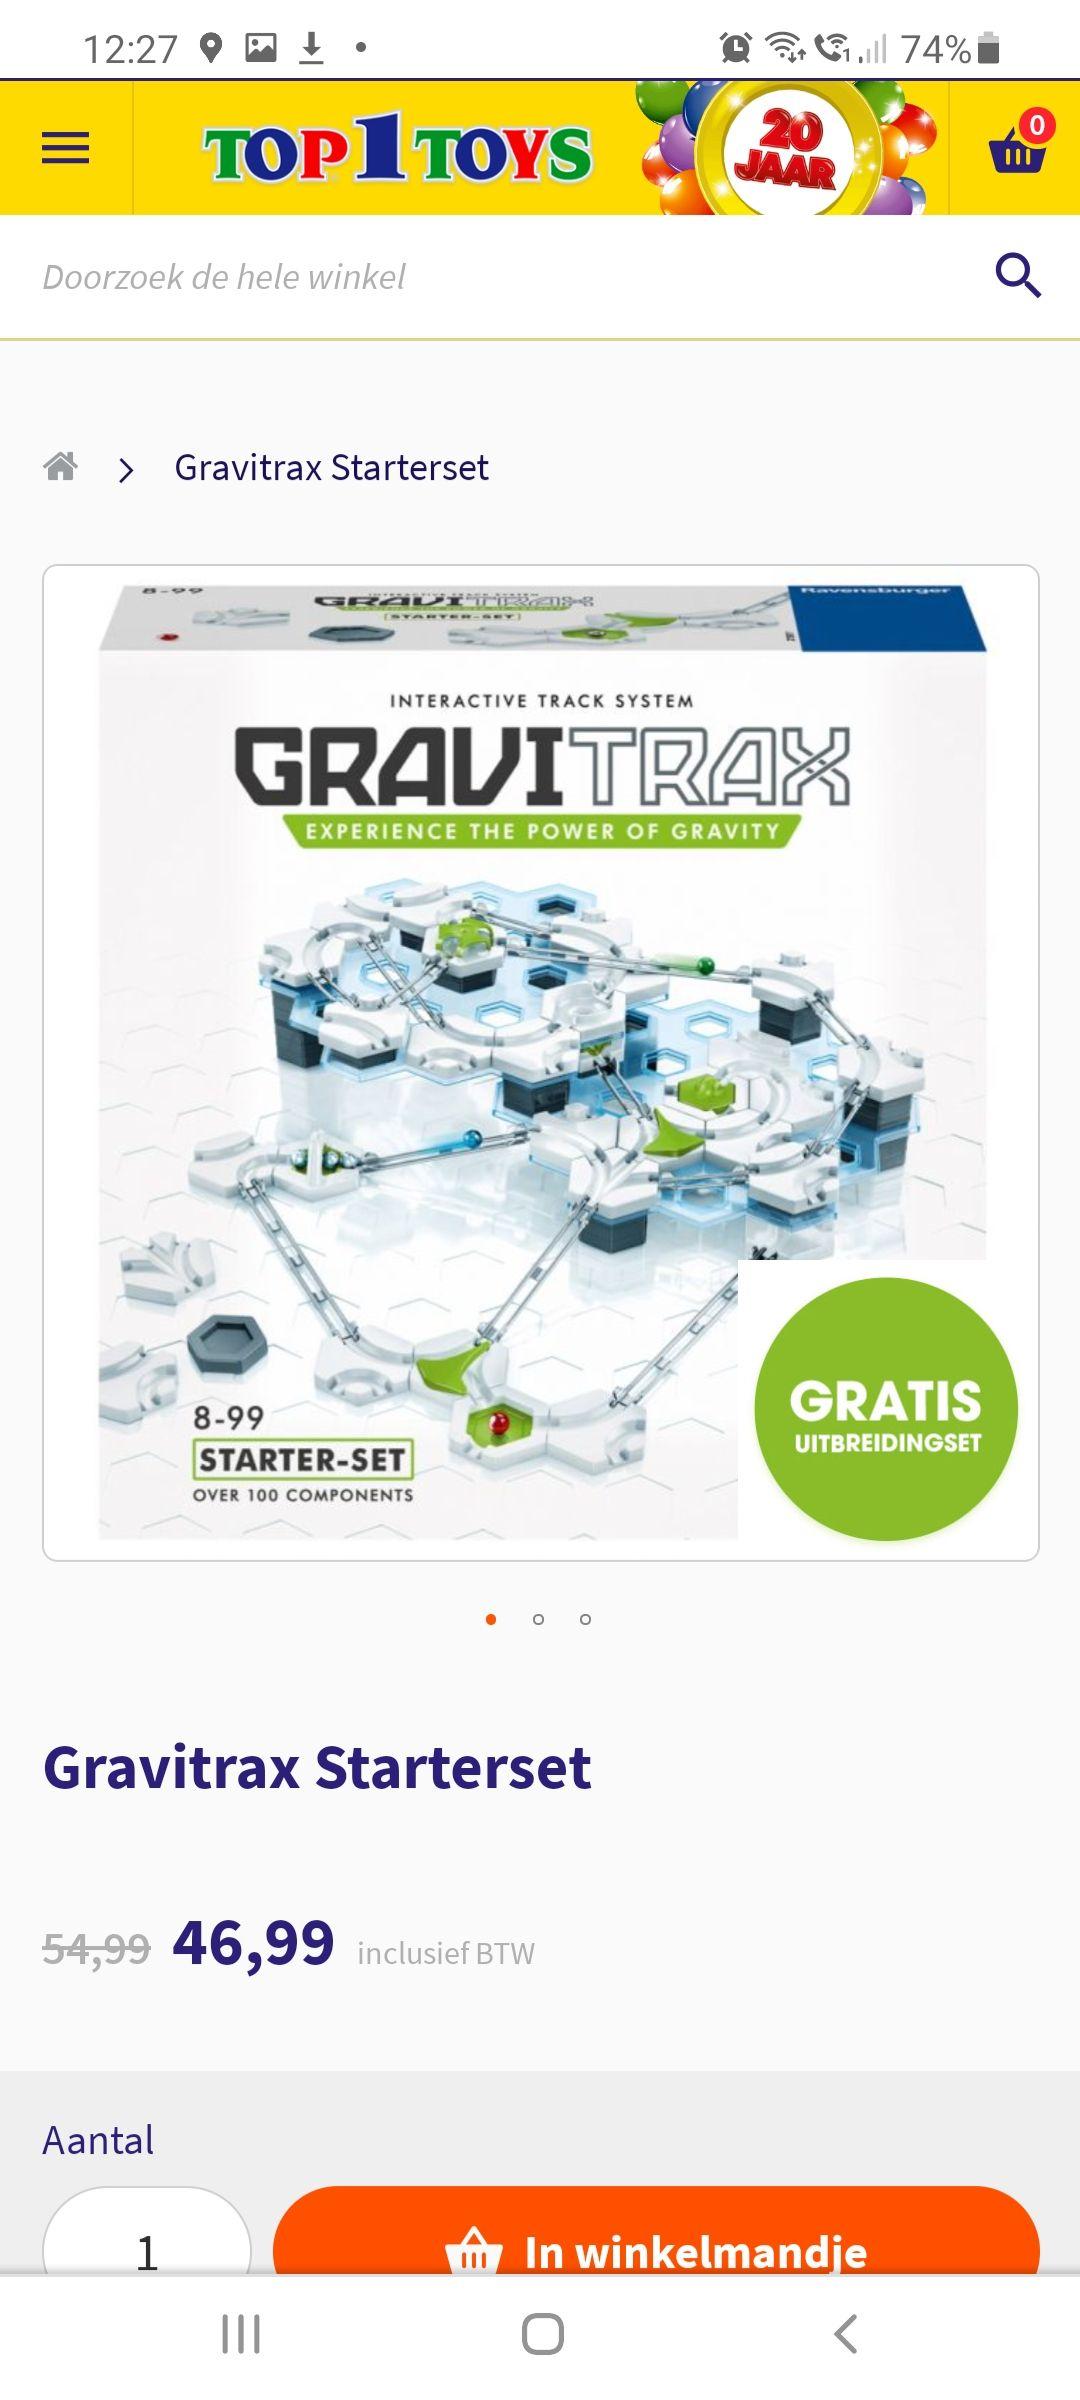 Gravitrax starterset incl. uitbreidingsset twv €11.99